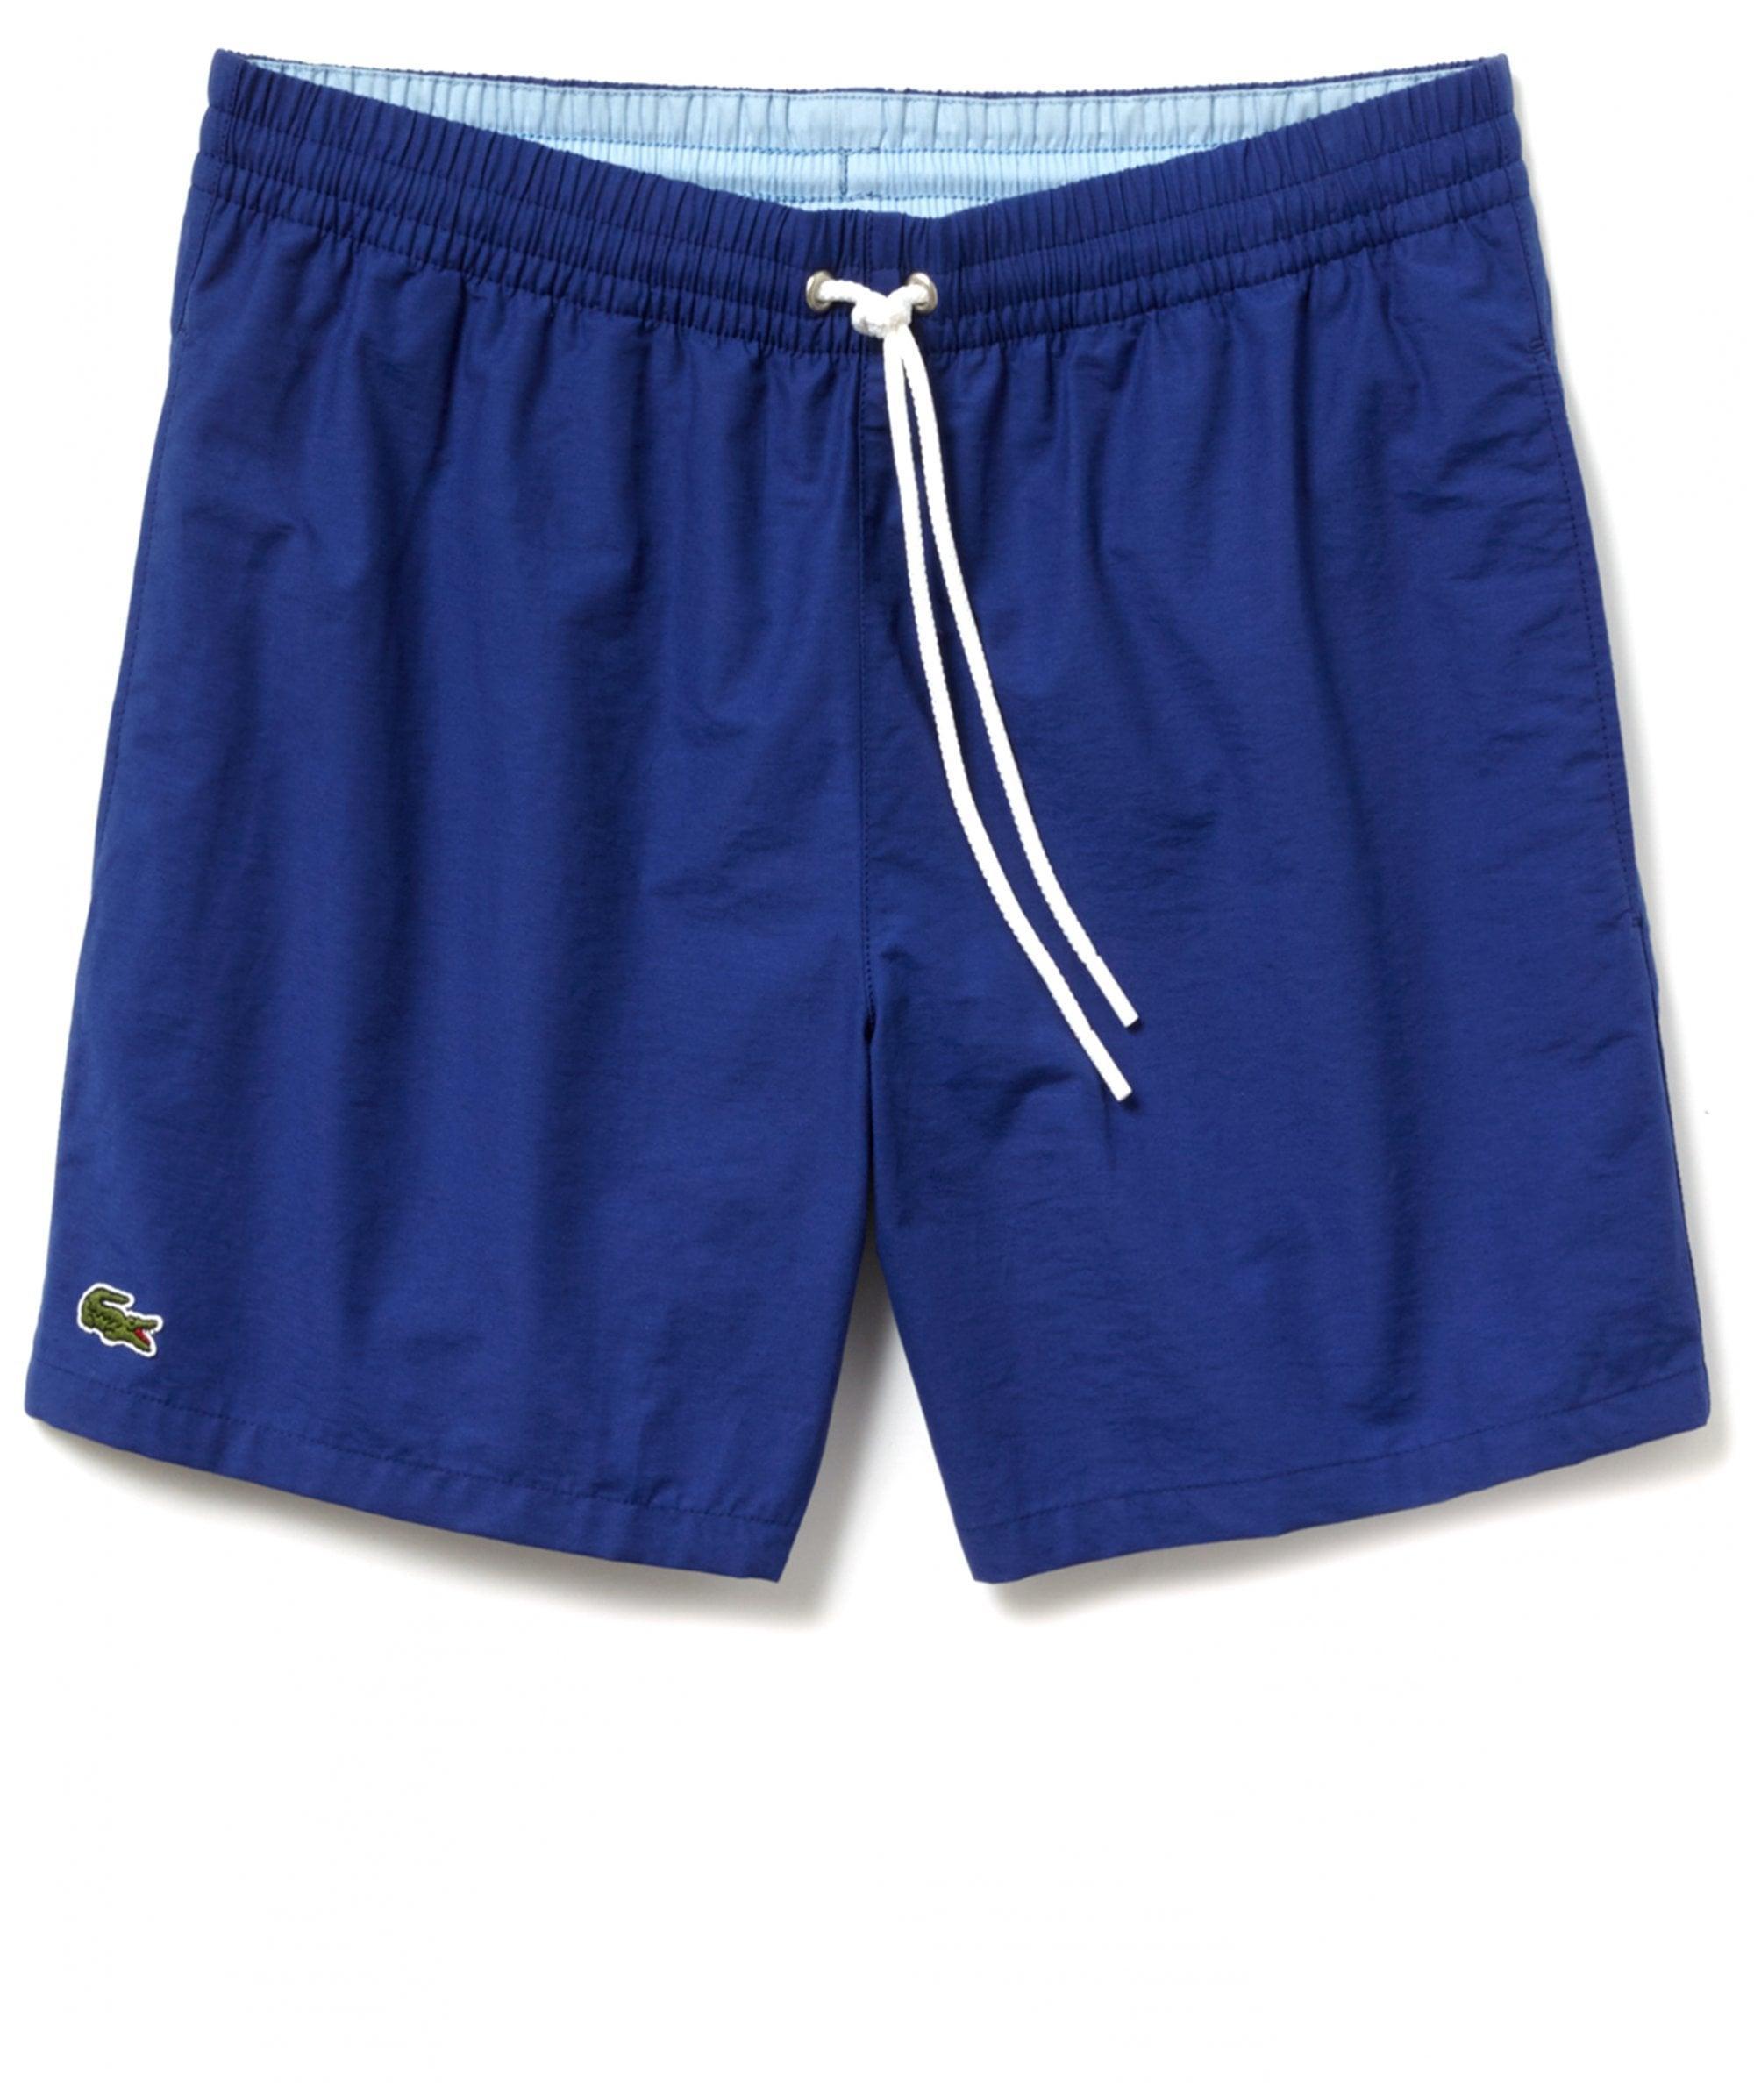 7eb13cdae0 Lyst - Lacoste Taffeta Swim Shorts in Blue for Men